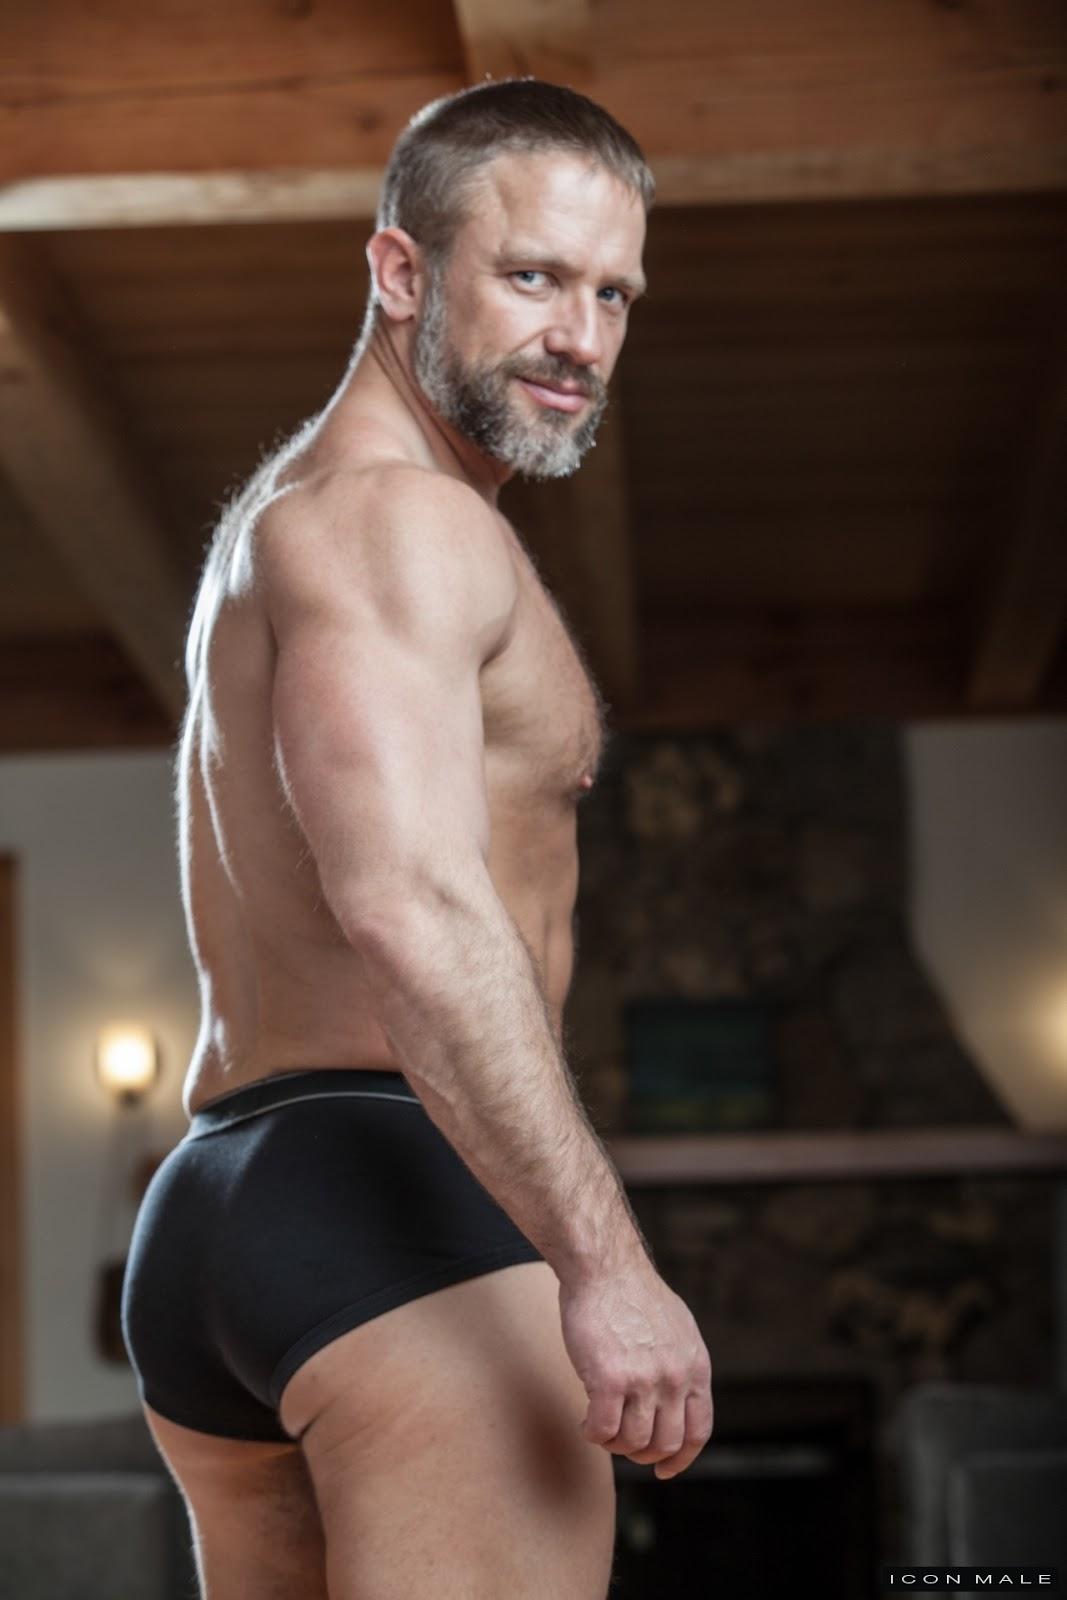 Mature naked men blog